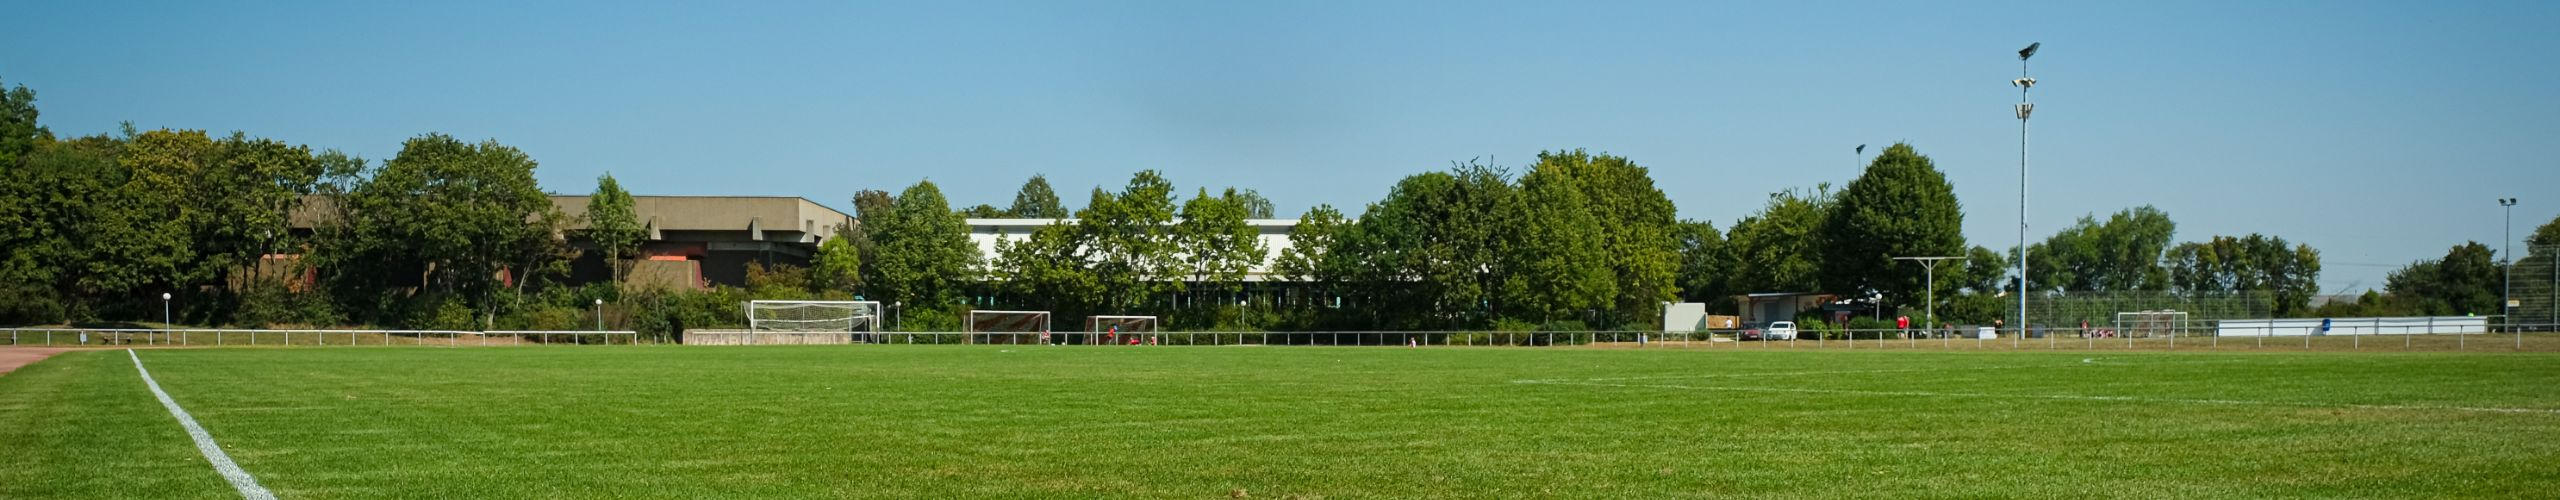 Fussball Hochheim